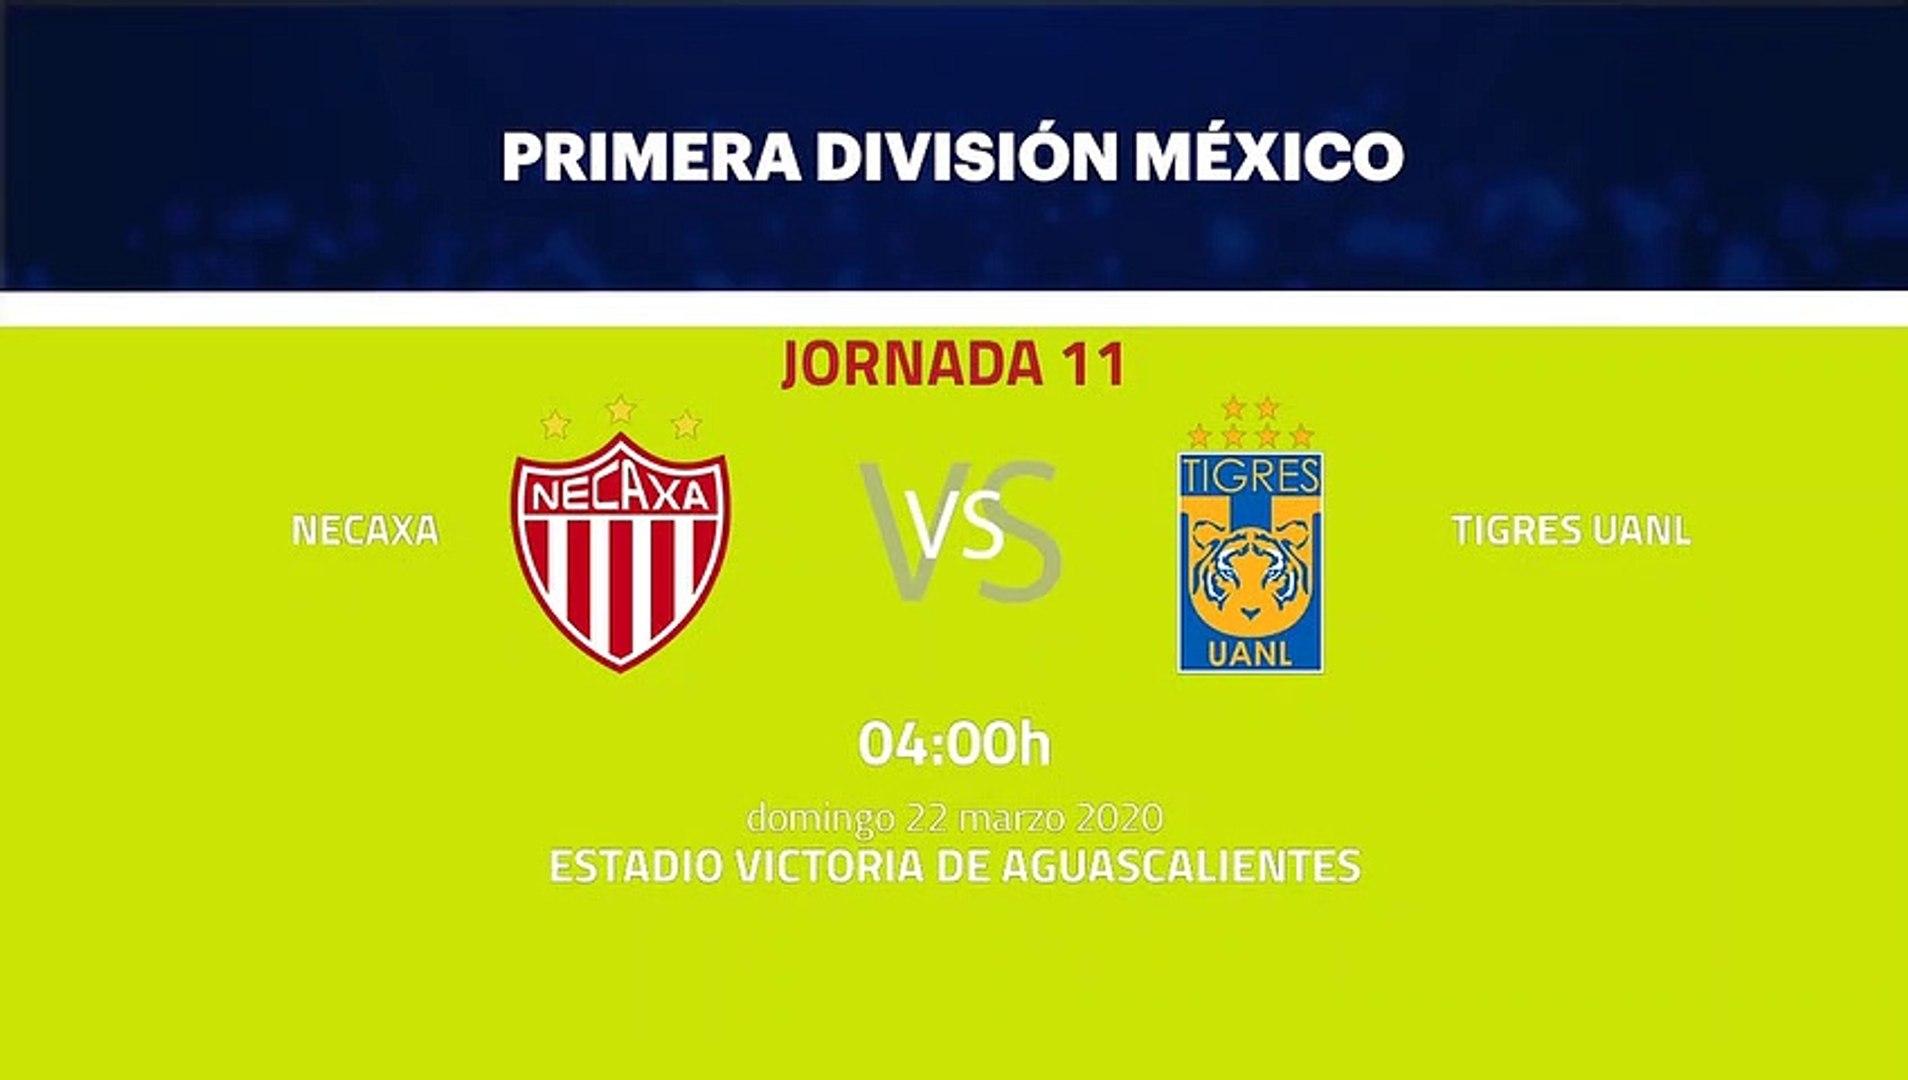 Previa partido entre Necaxa y Tigres UANL Jornada 11 Liga MX - Clausura